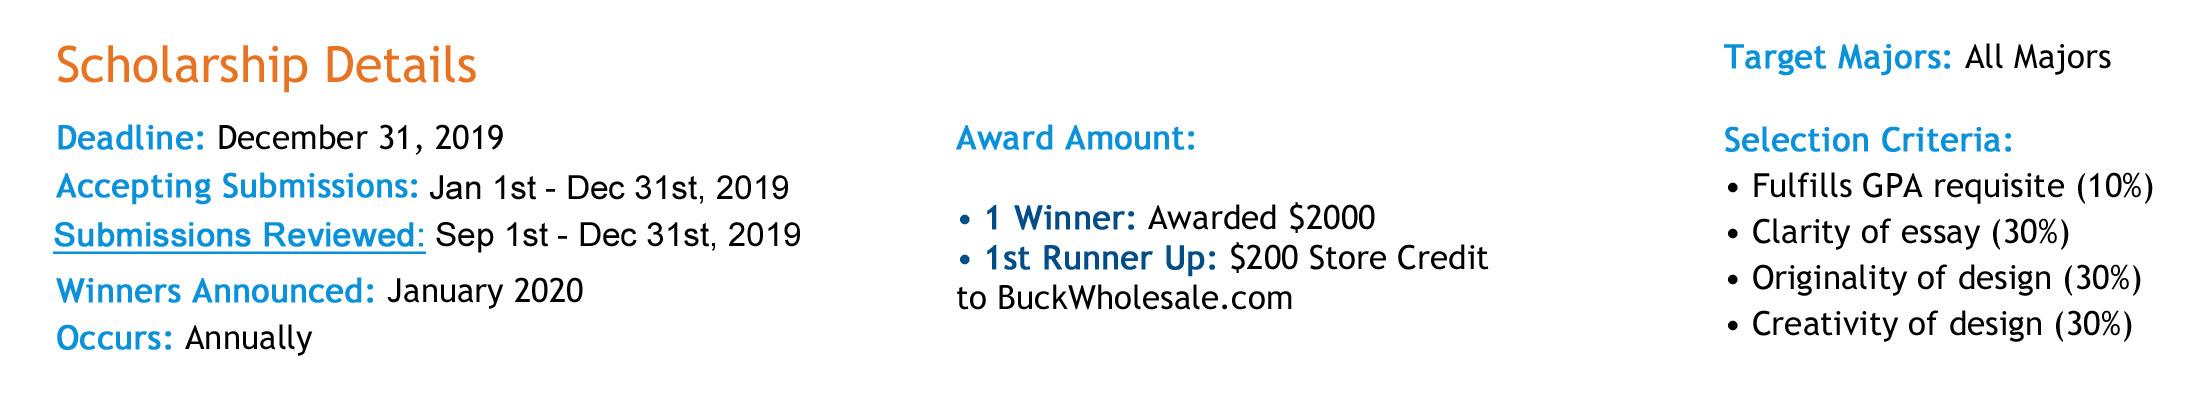 scholarship-details-buckwholesale-f.jpg